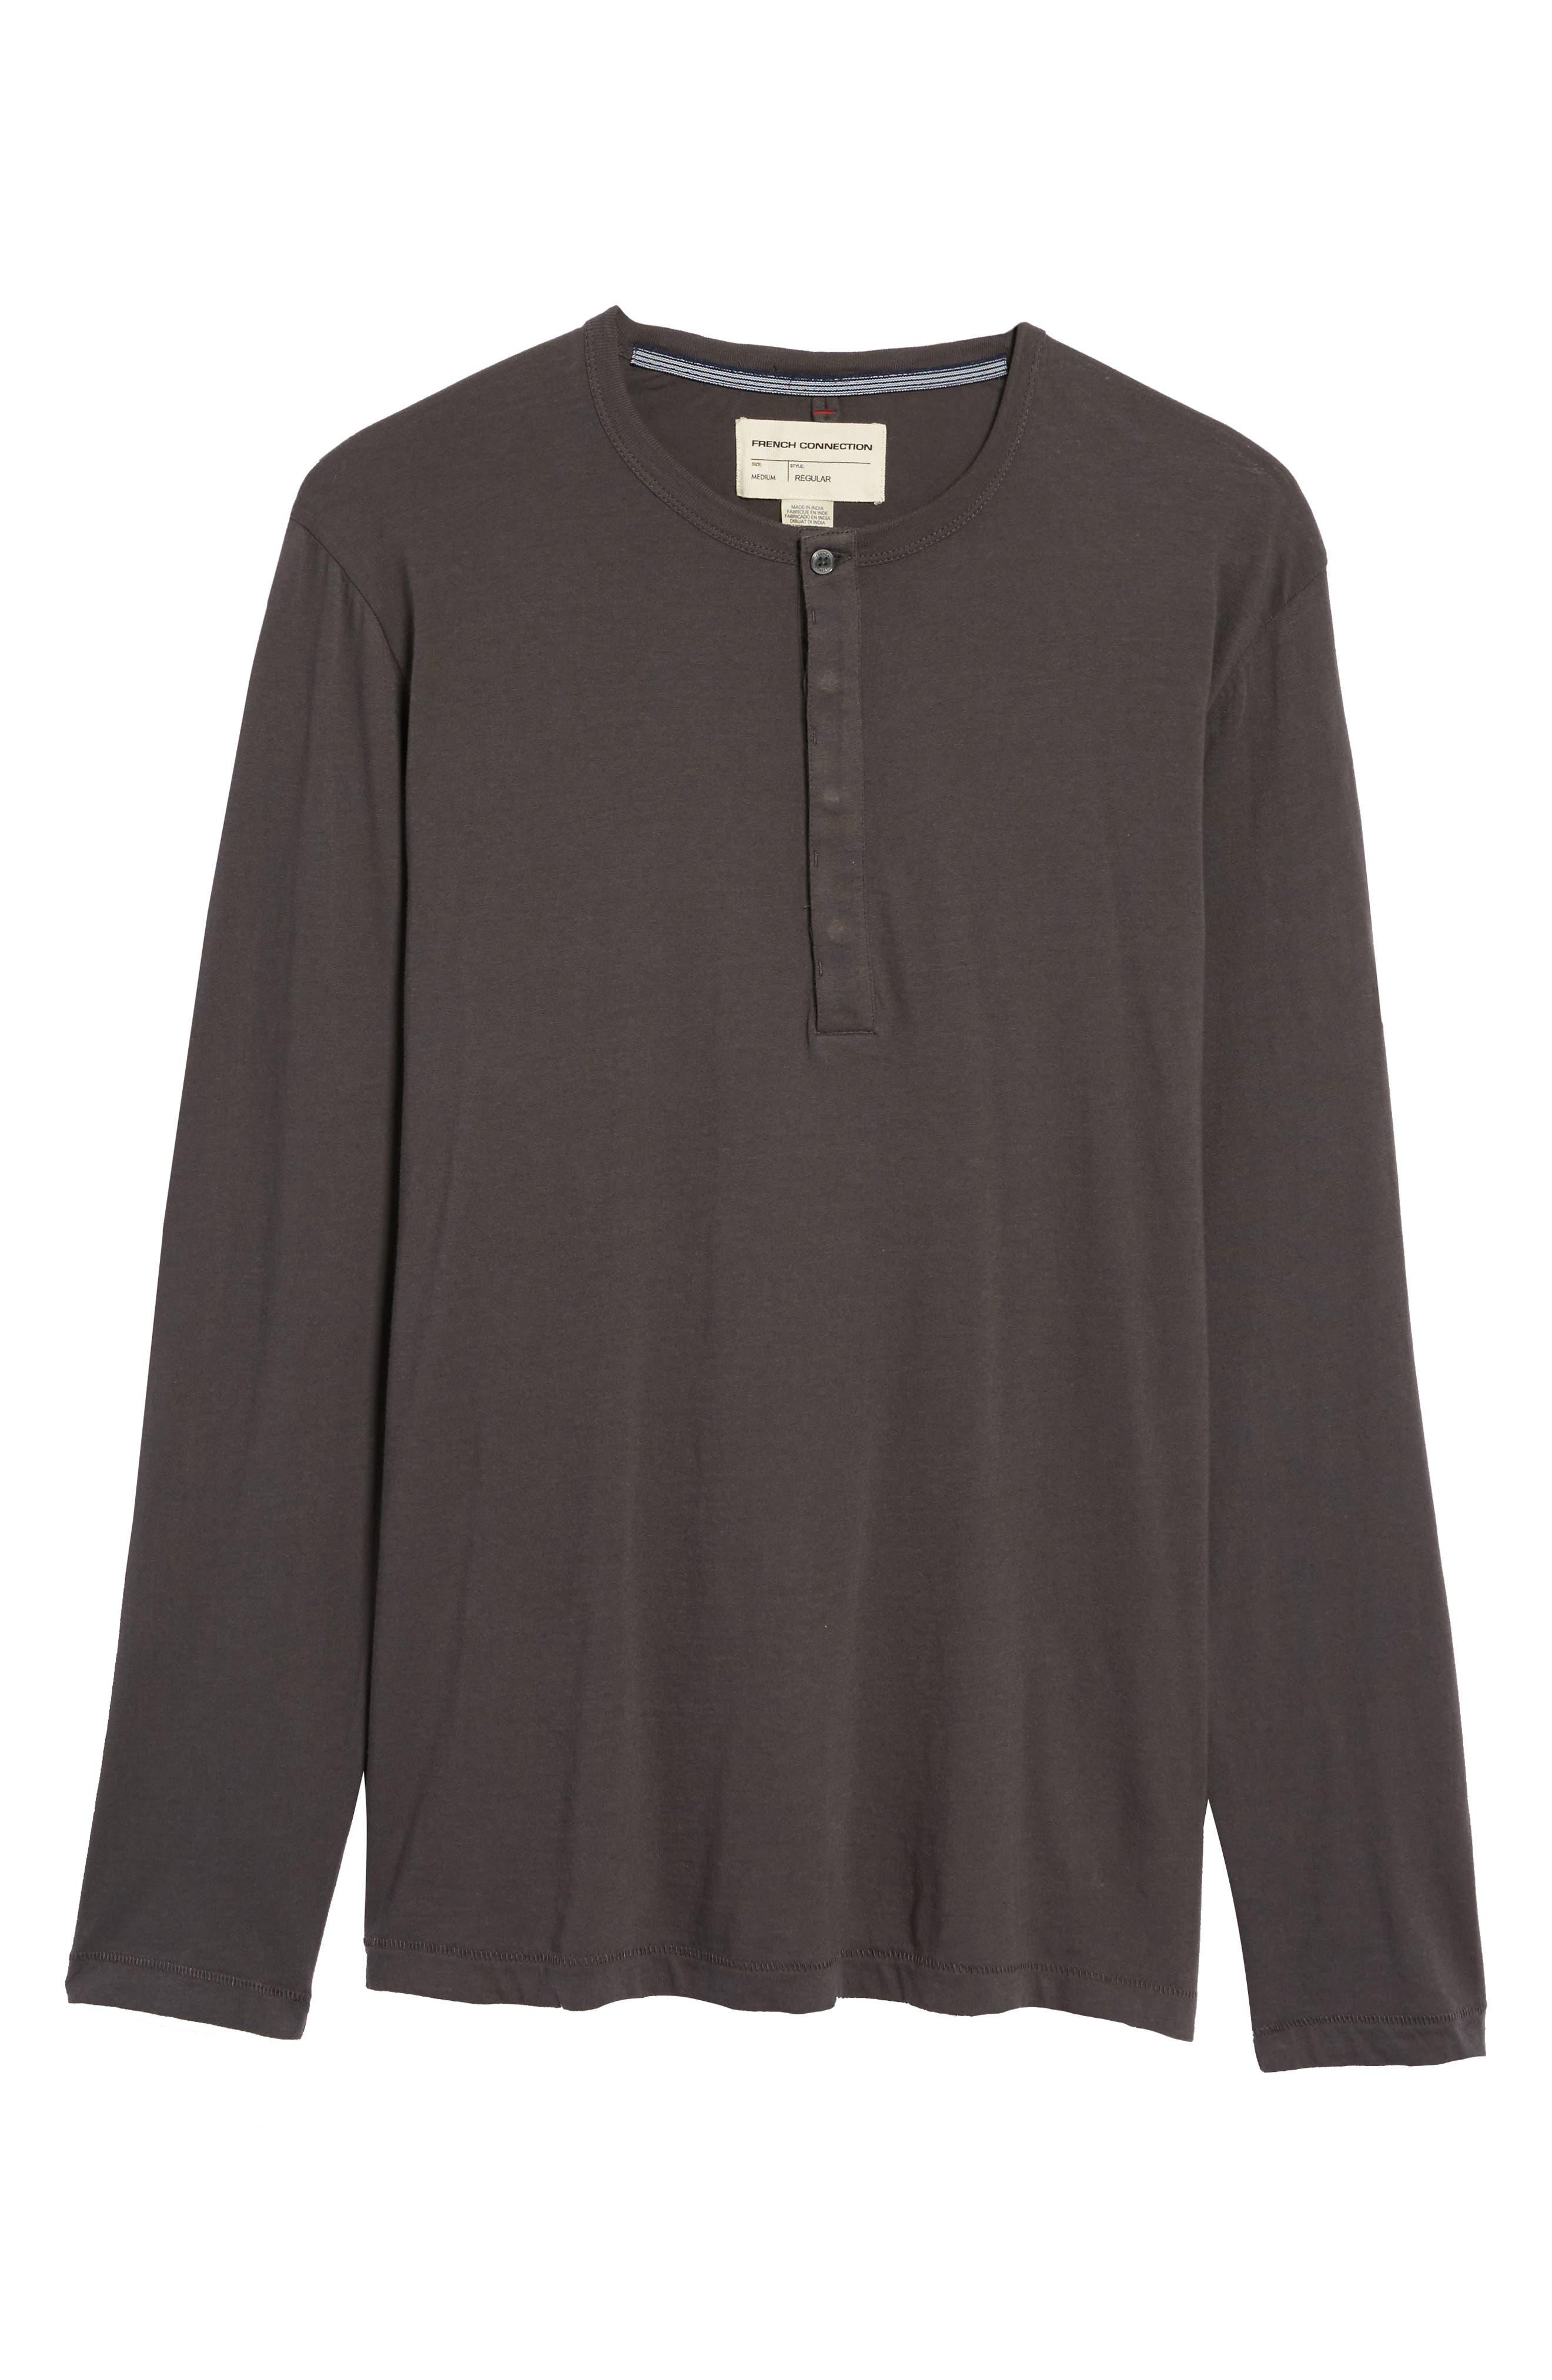 Long-Sleeve Henley T-Shirt,                             Alternate thumbnail 6, color,                             020